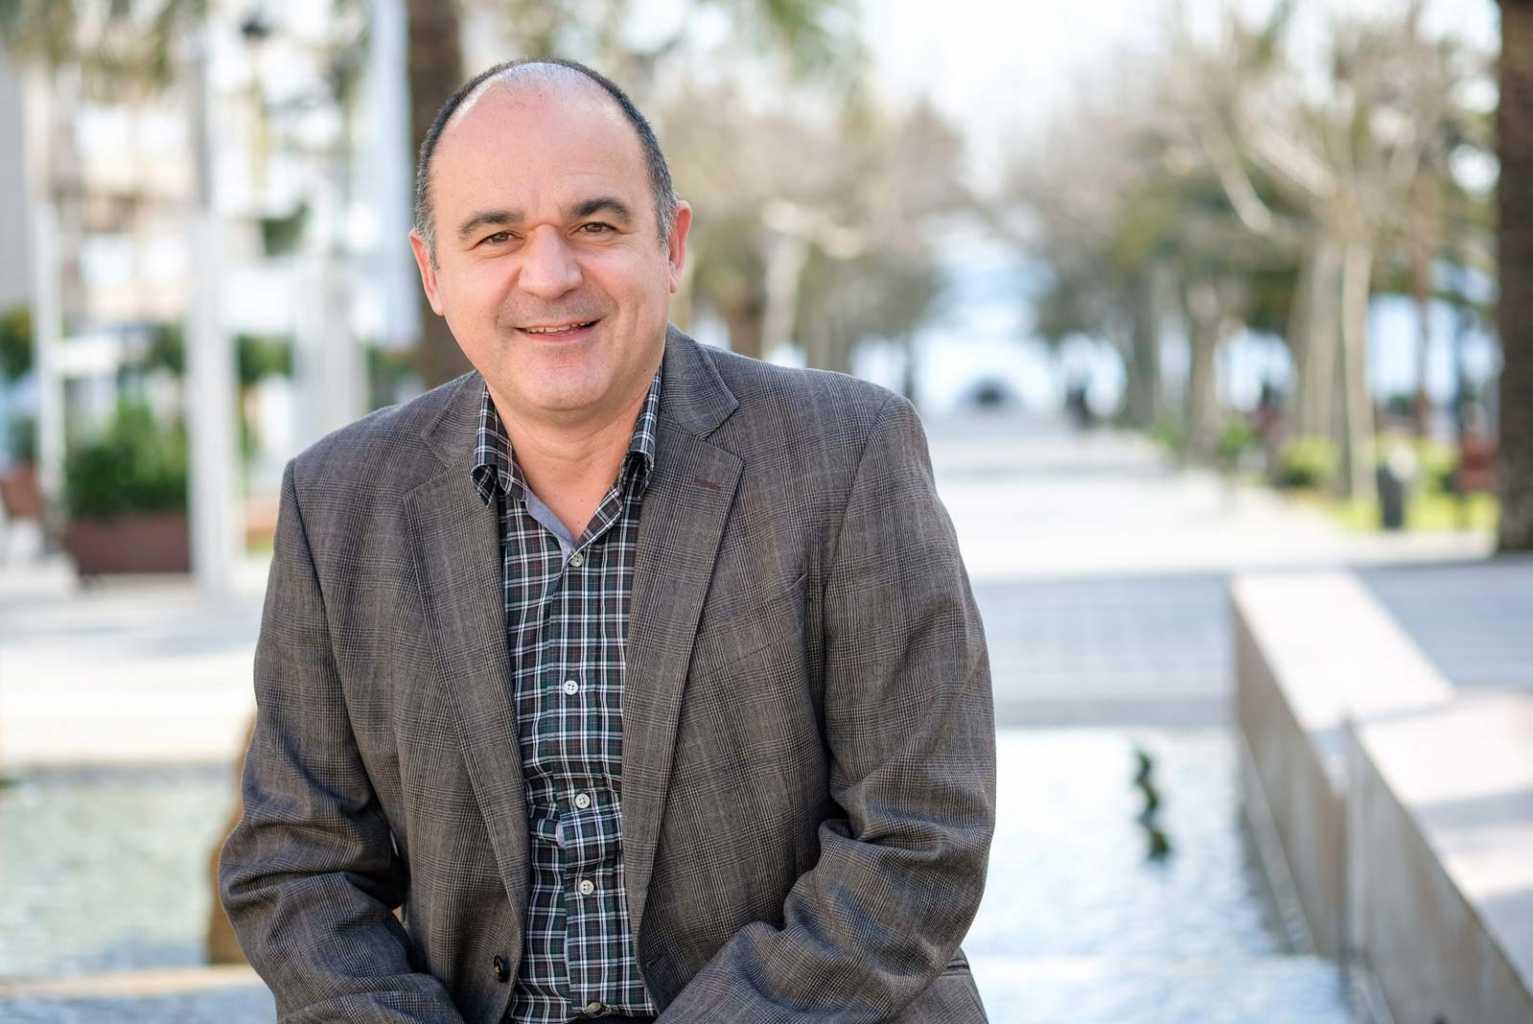 El alcalde de Santa Eulària, Vicent Marí. Sergio G. Cañizares